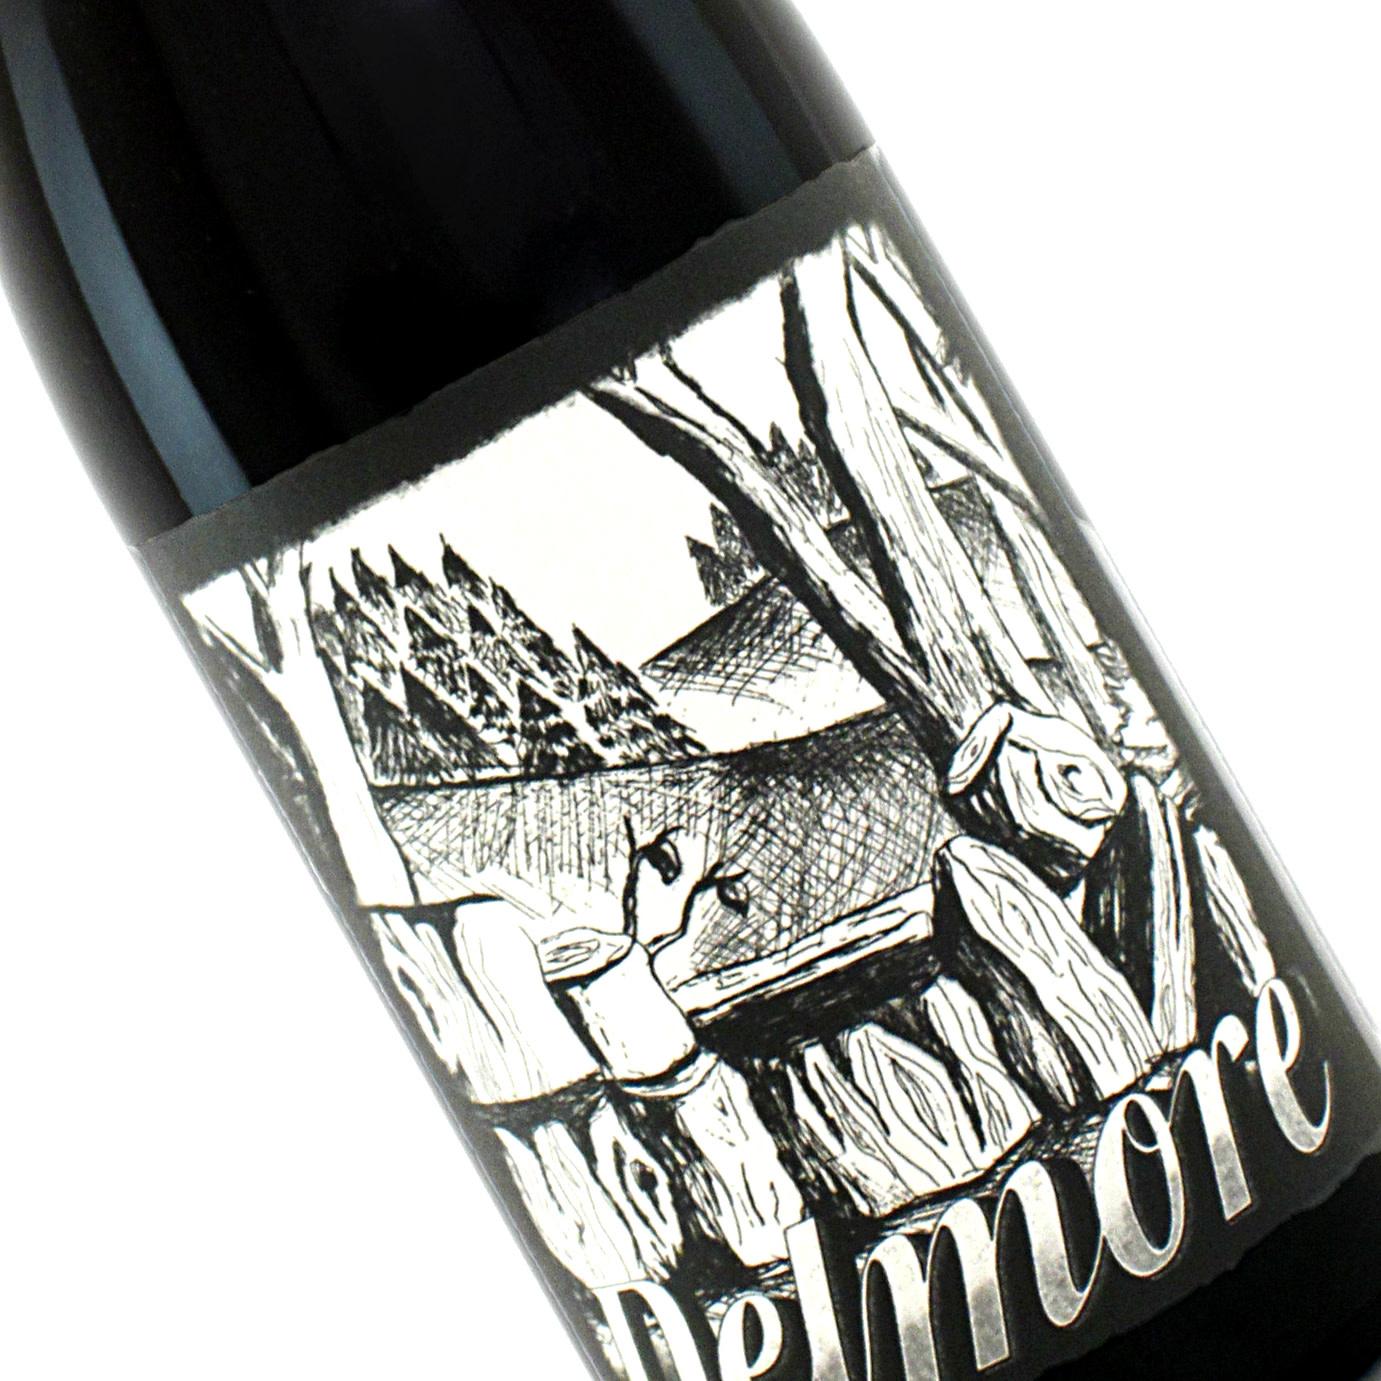 Delmore 2020 Pinot Noir, Central Coast